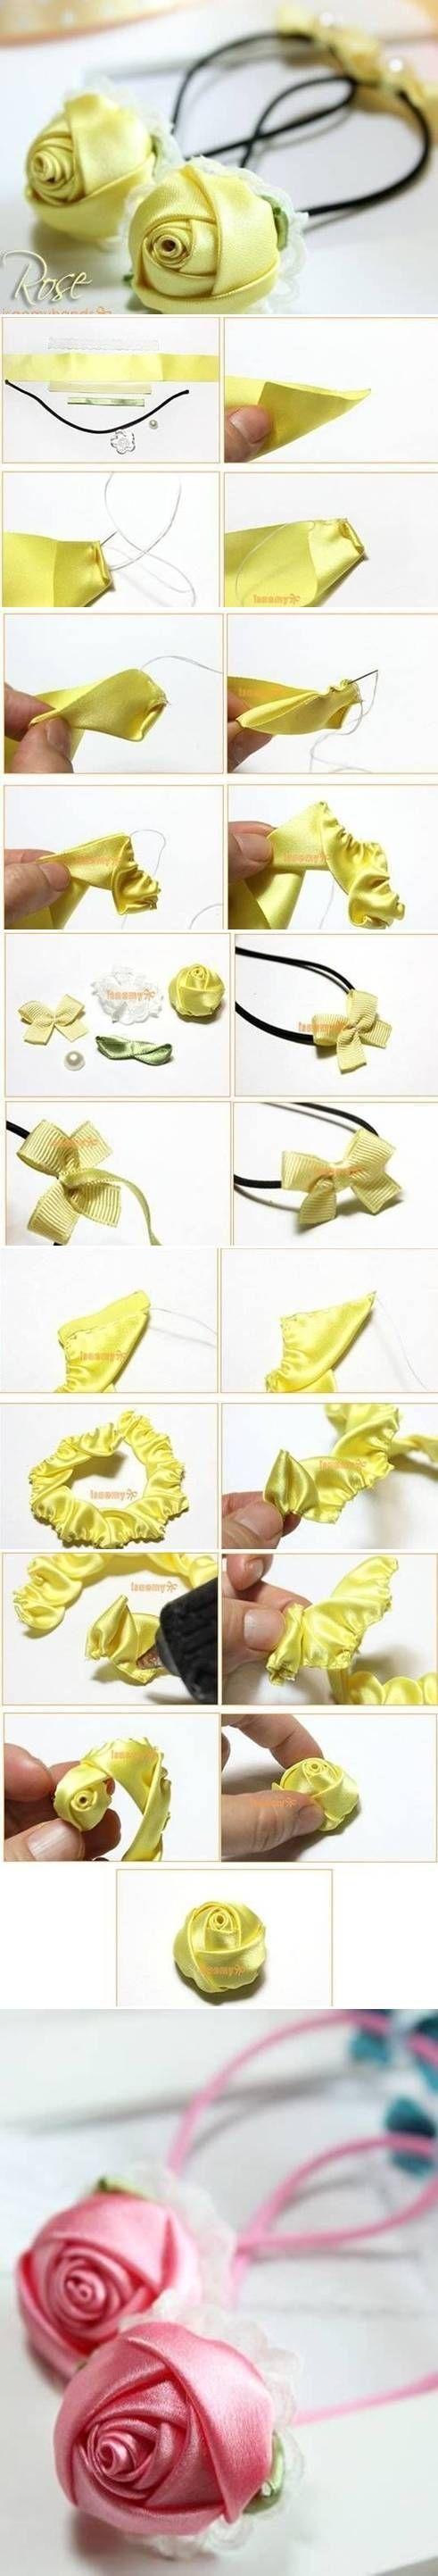 DIY Satin Roses diy craft crafts diy crafts how to craft flowers tutorials hair accessories